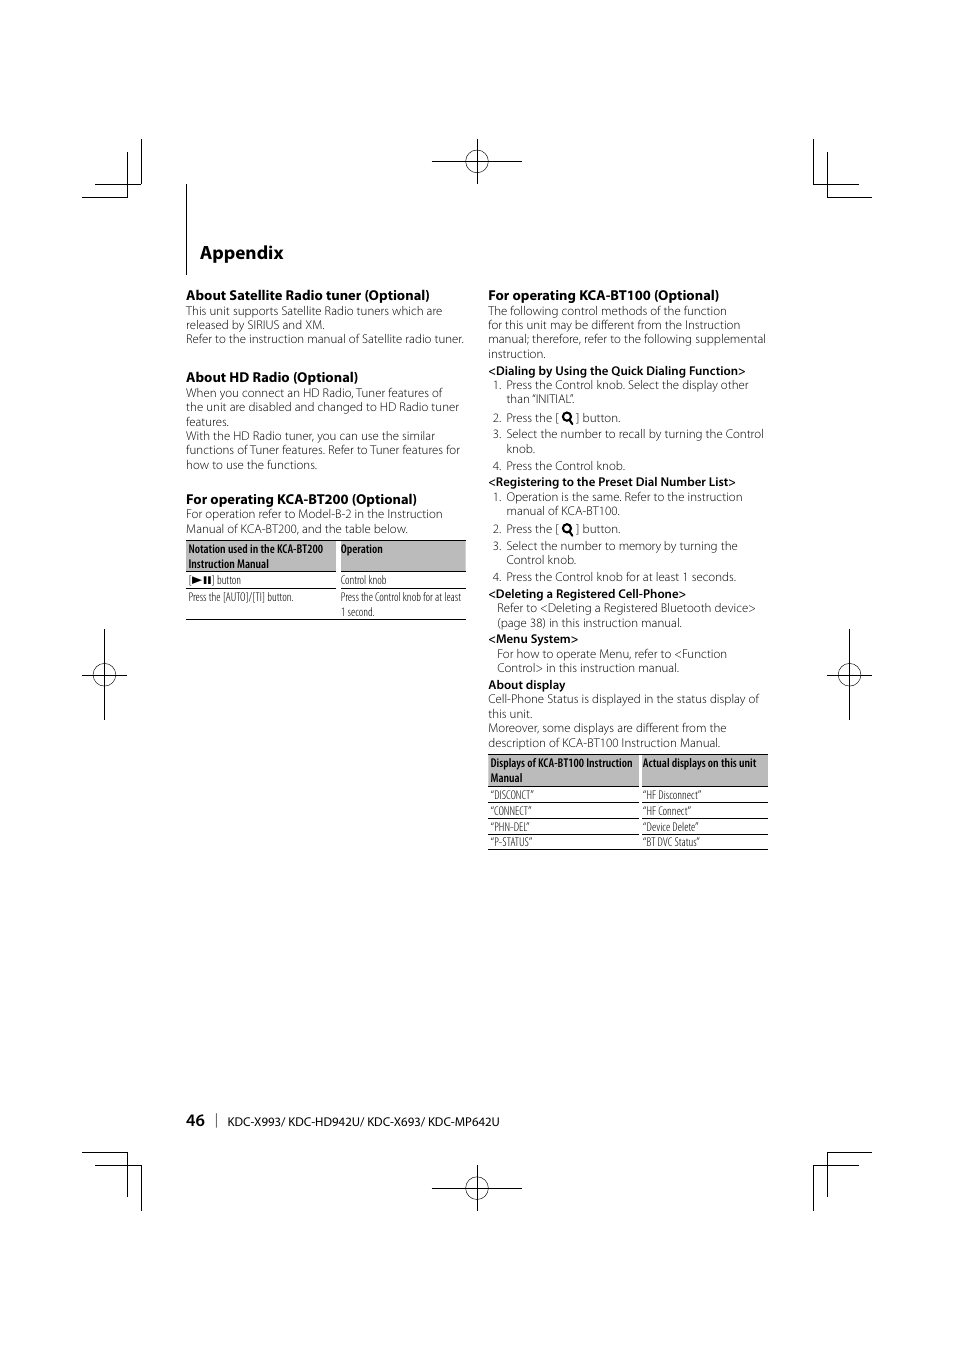 Mnl 7297 Kenwood Excelon Kdc X994 Manual 2019 Ebook Library Wiring Diagram Appendix Mp642u User Page 46 60 Rh Manualsdir Com Hd942u